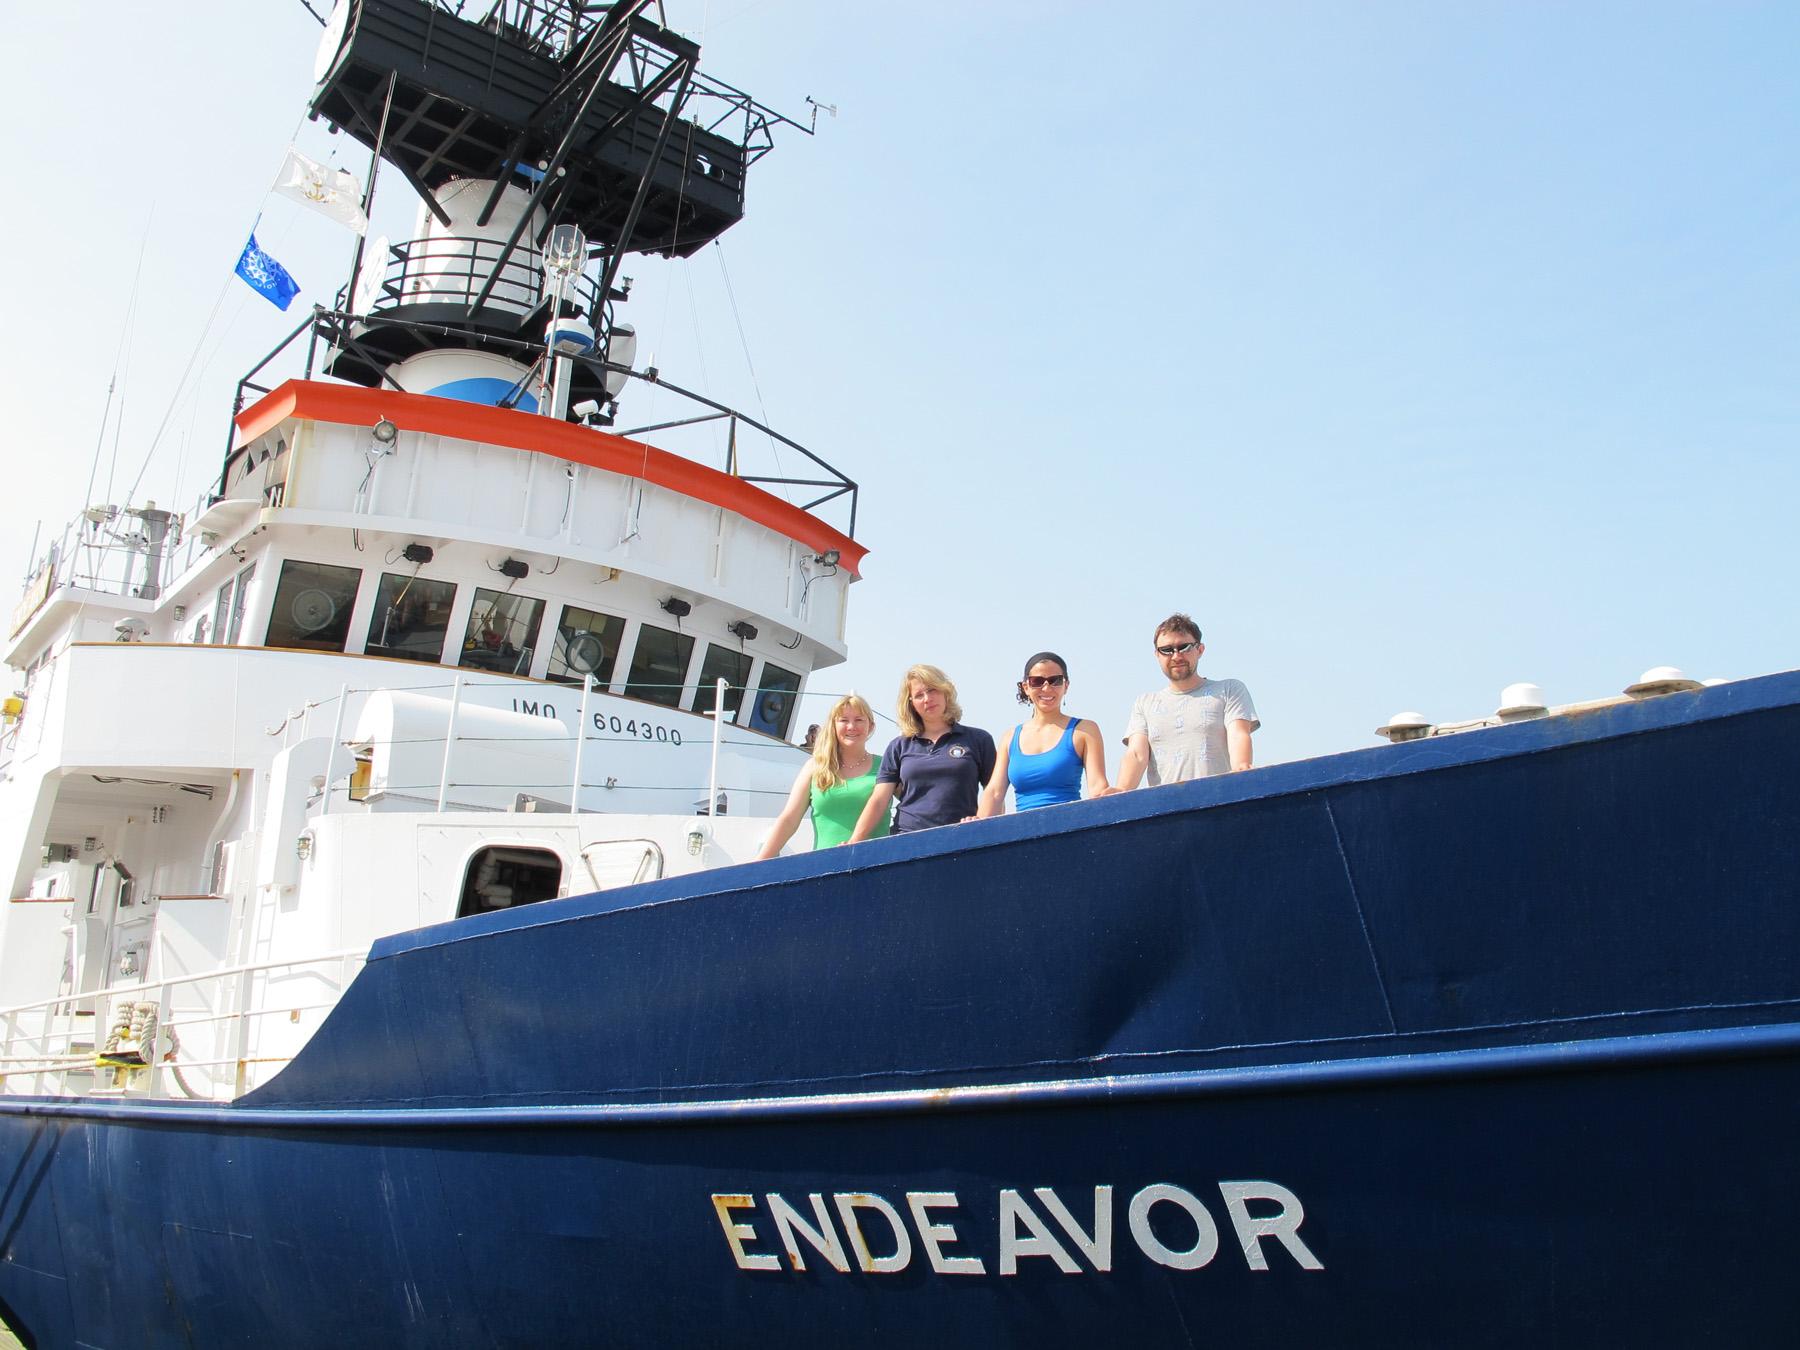 R/V Endeavor on June, 2012 cruise with Joye Research Group team (lt to rt: Joy Battles, Johanna Schweers, Dr. Melitza Crespo-Medina, and Ryan Sibert)